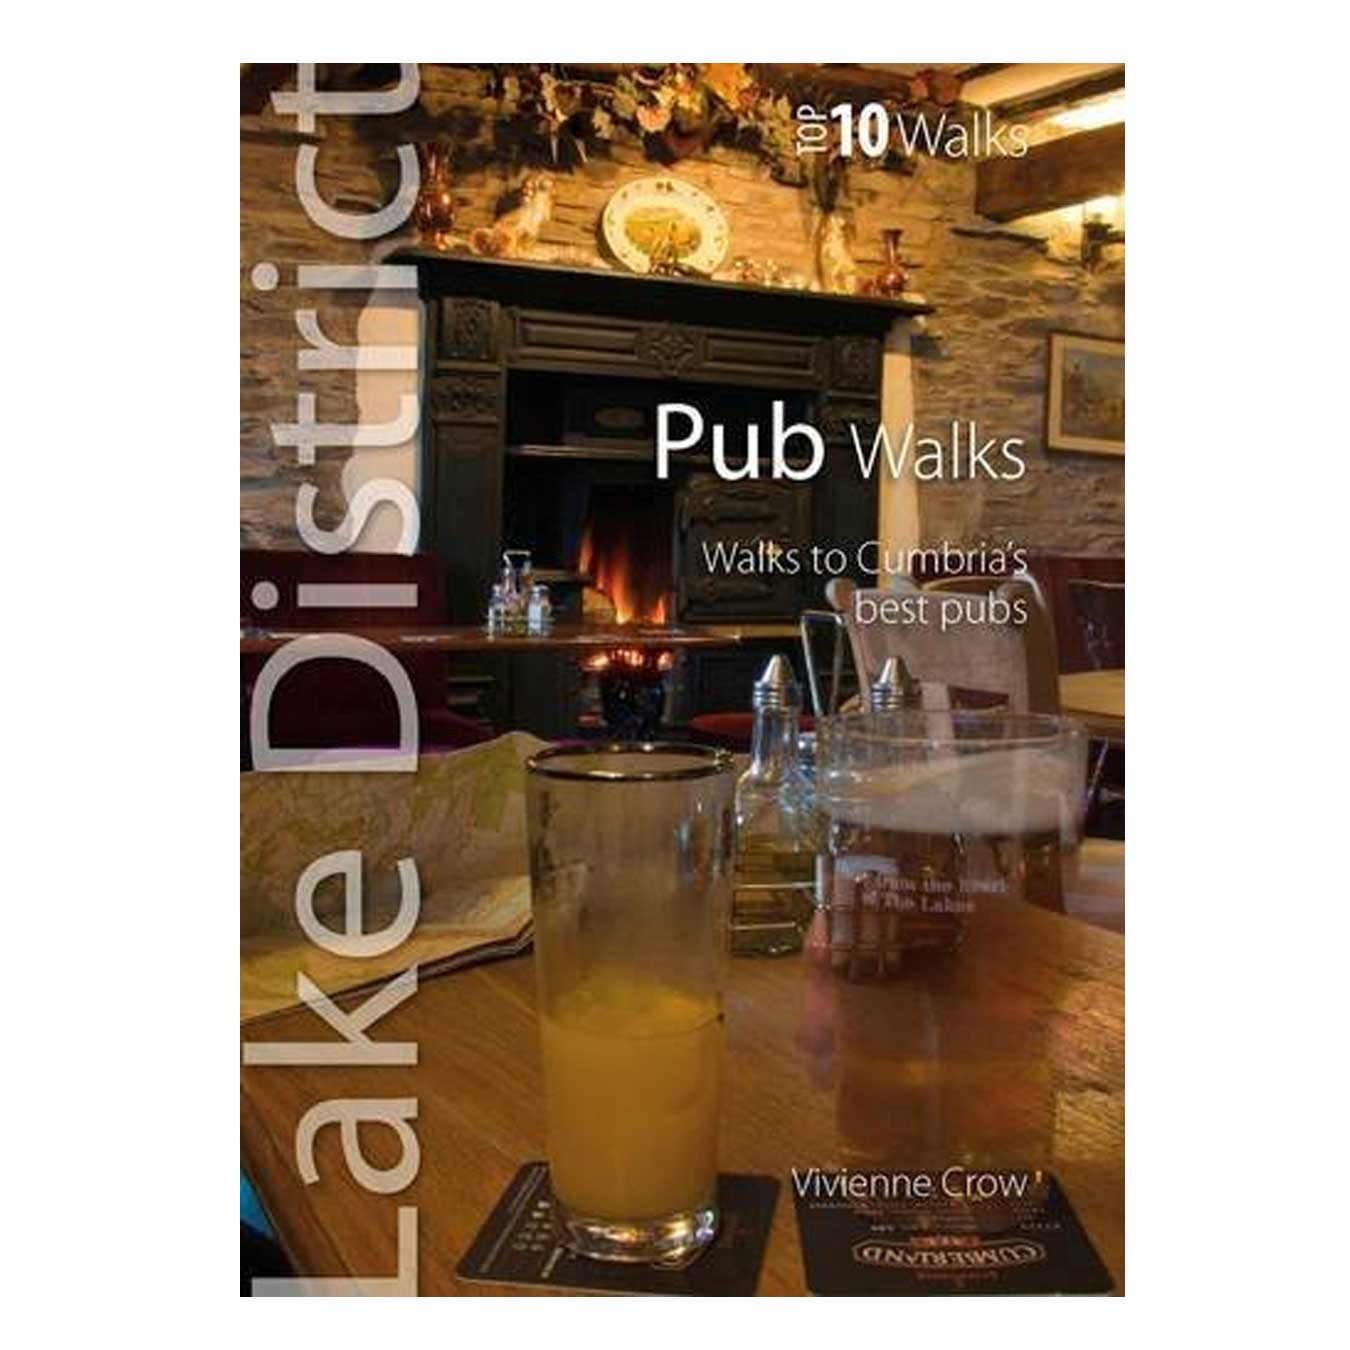 Pub Walks: Walks to Cumbria's Best Pubs